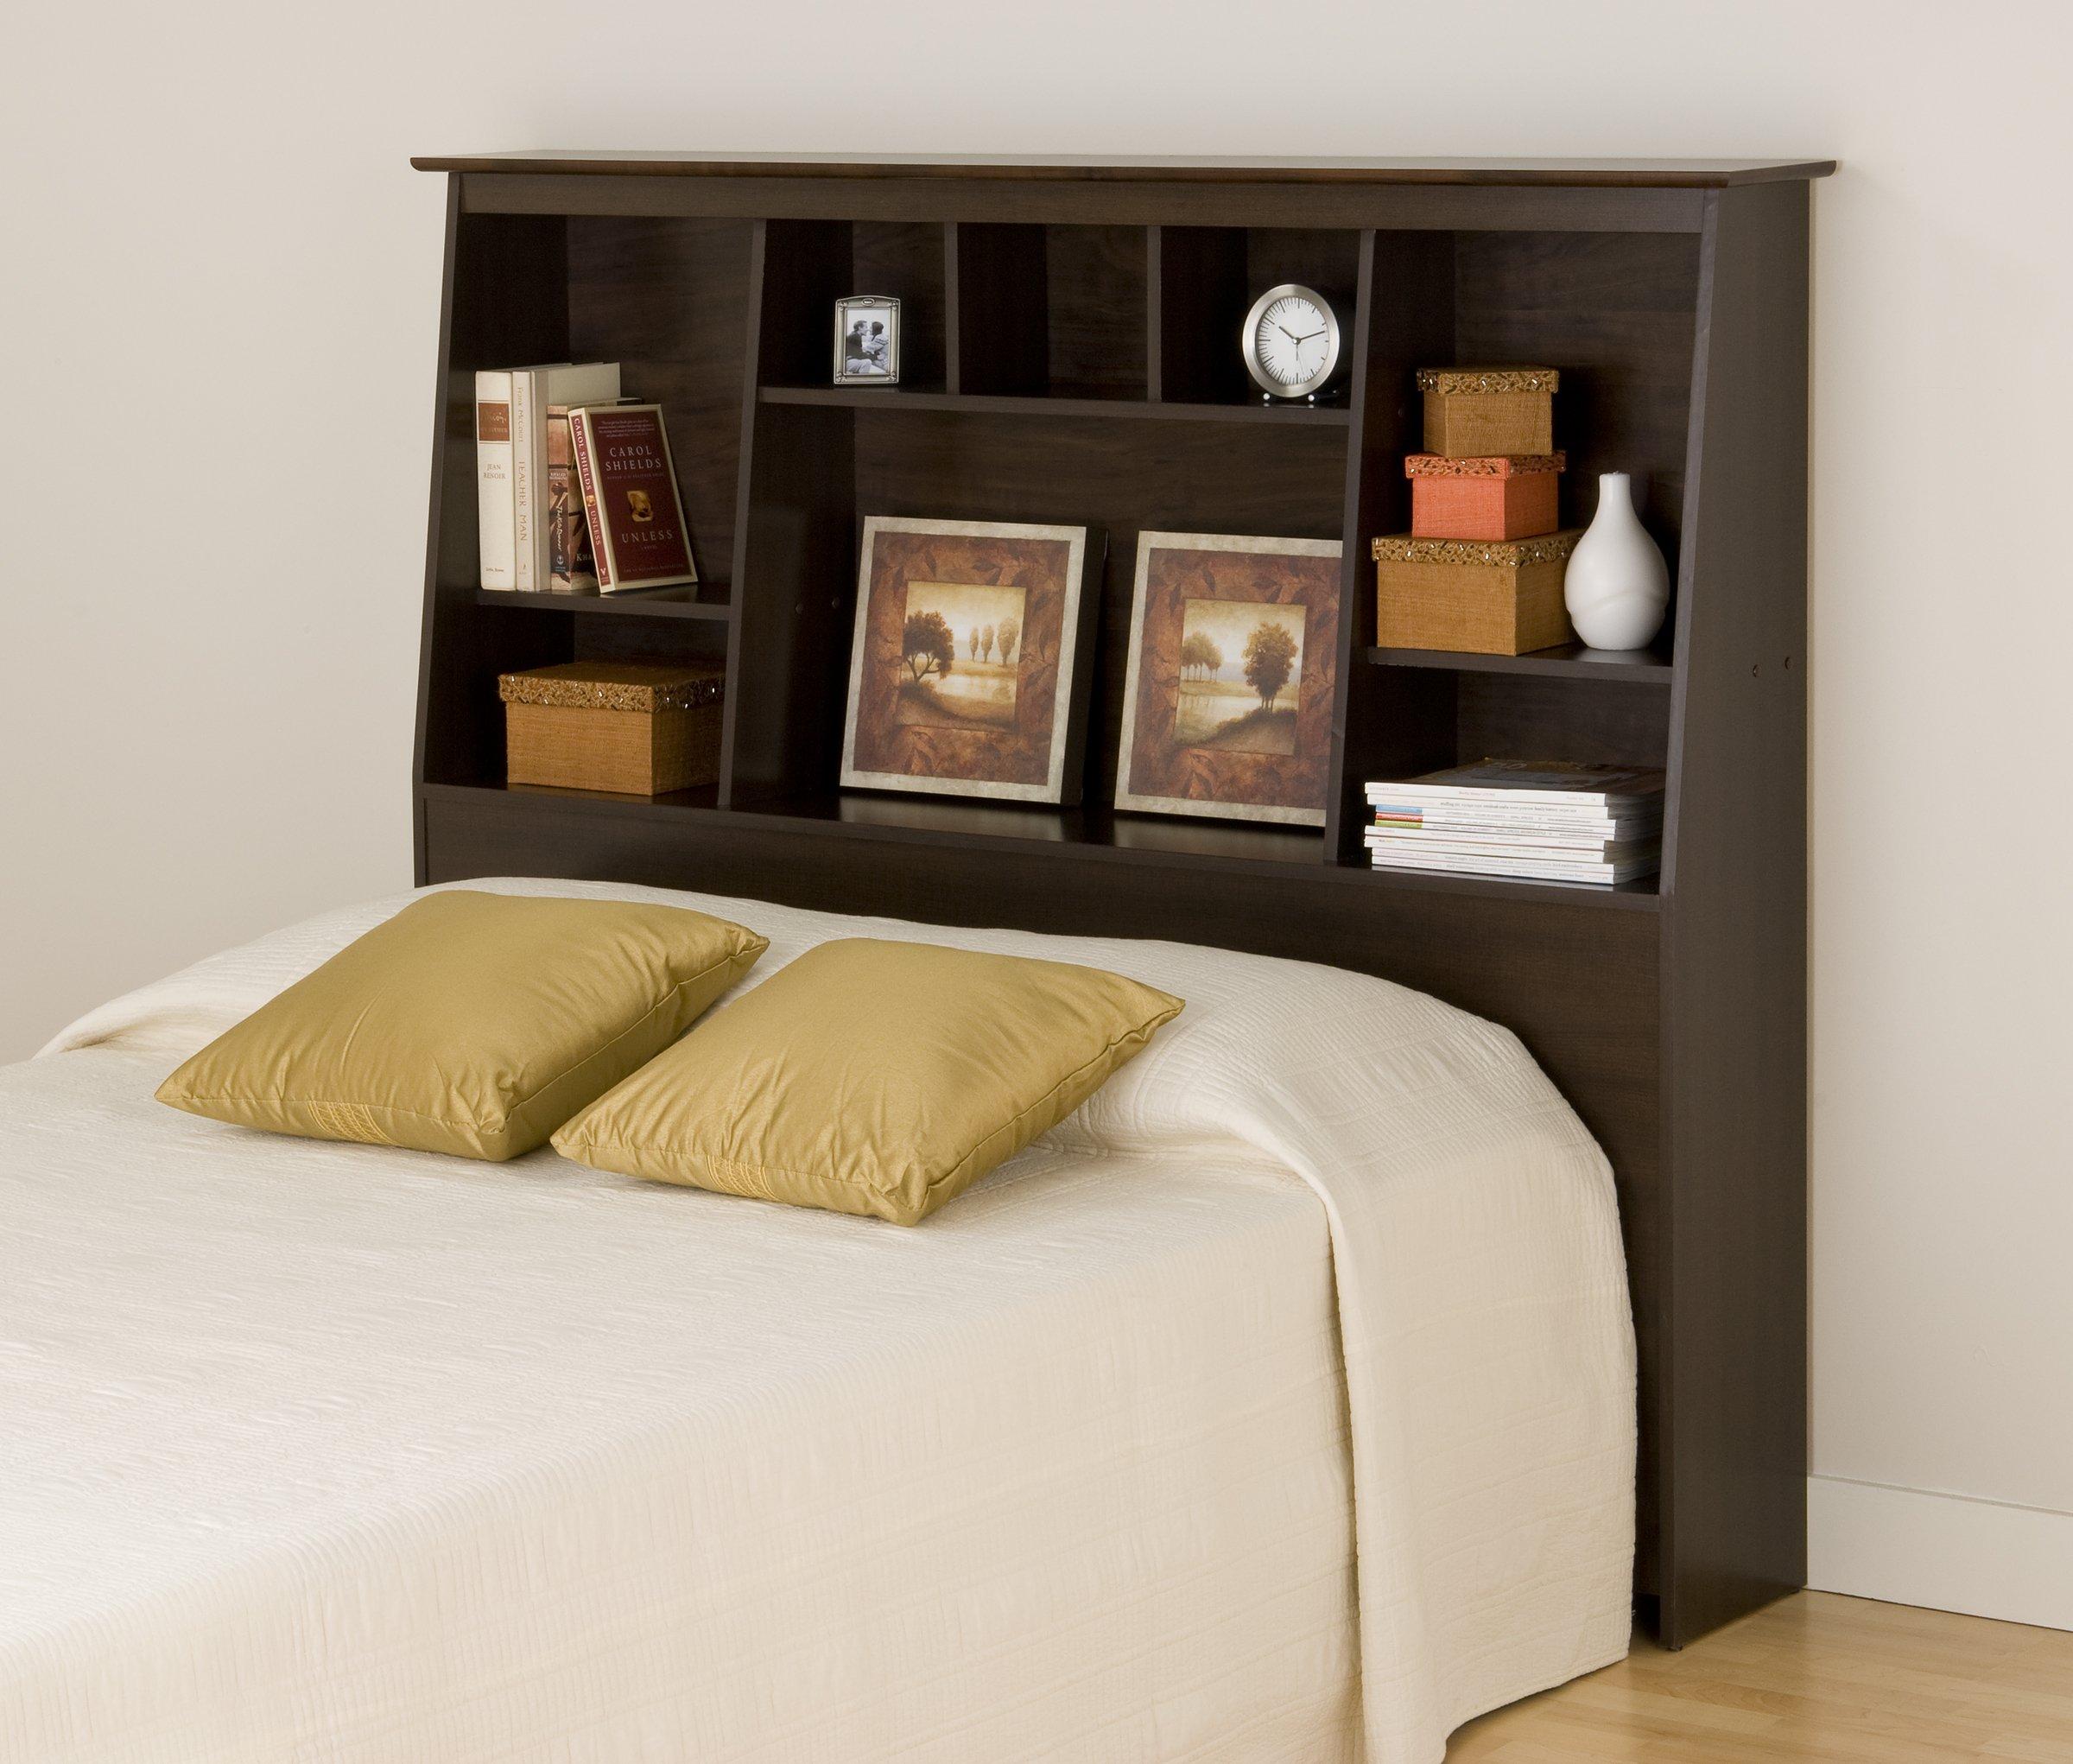 Prepac ESH-6656 Tall Slant-Back Bookcase Headboard, Espresso, Full/Queen